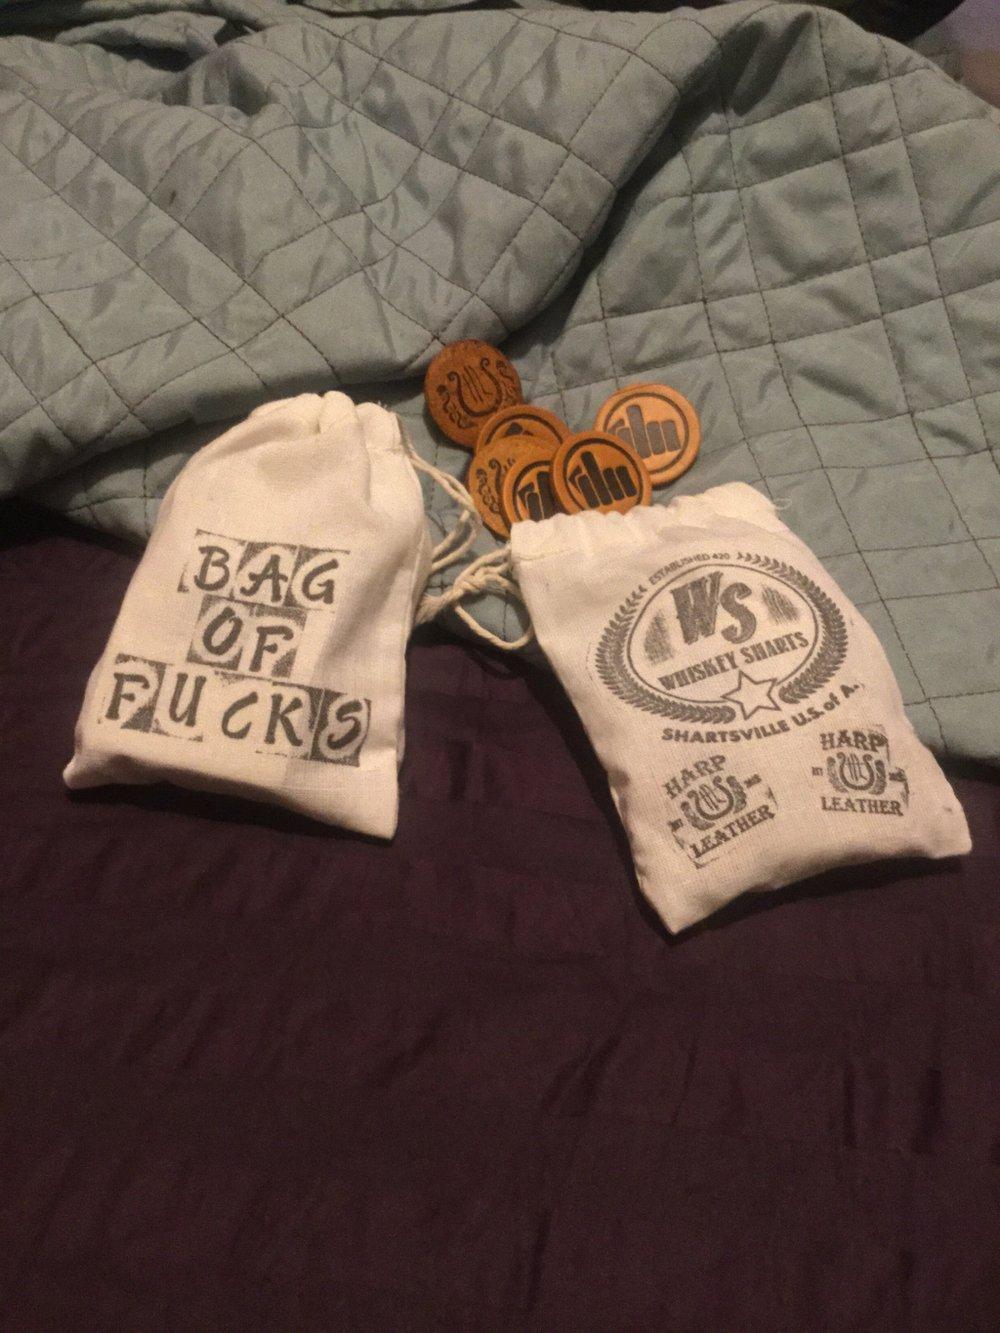 Image of Bag O' Fucks by Harp Leather